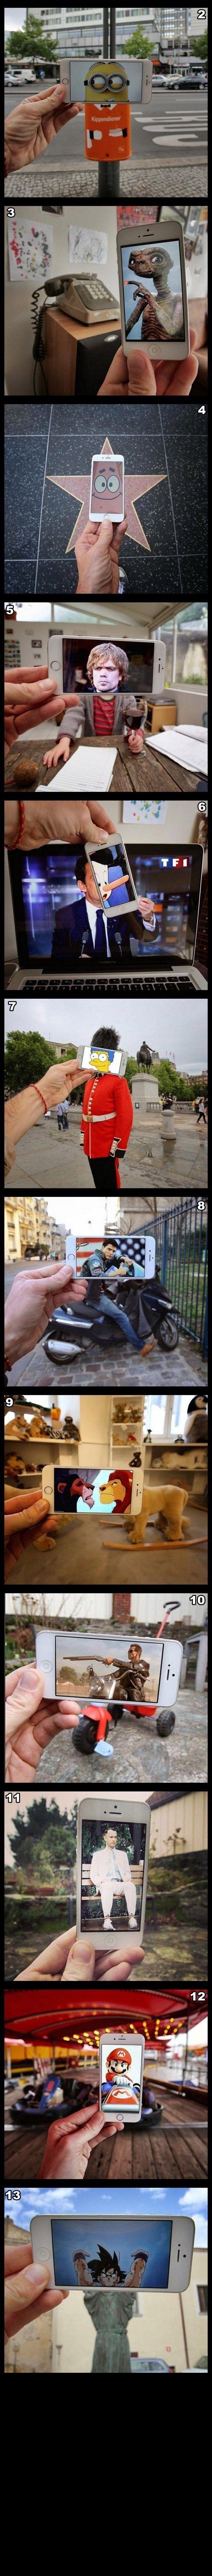 Lustige Iphone-Photos - Story des Tages 12.10.2015 | Funcloud